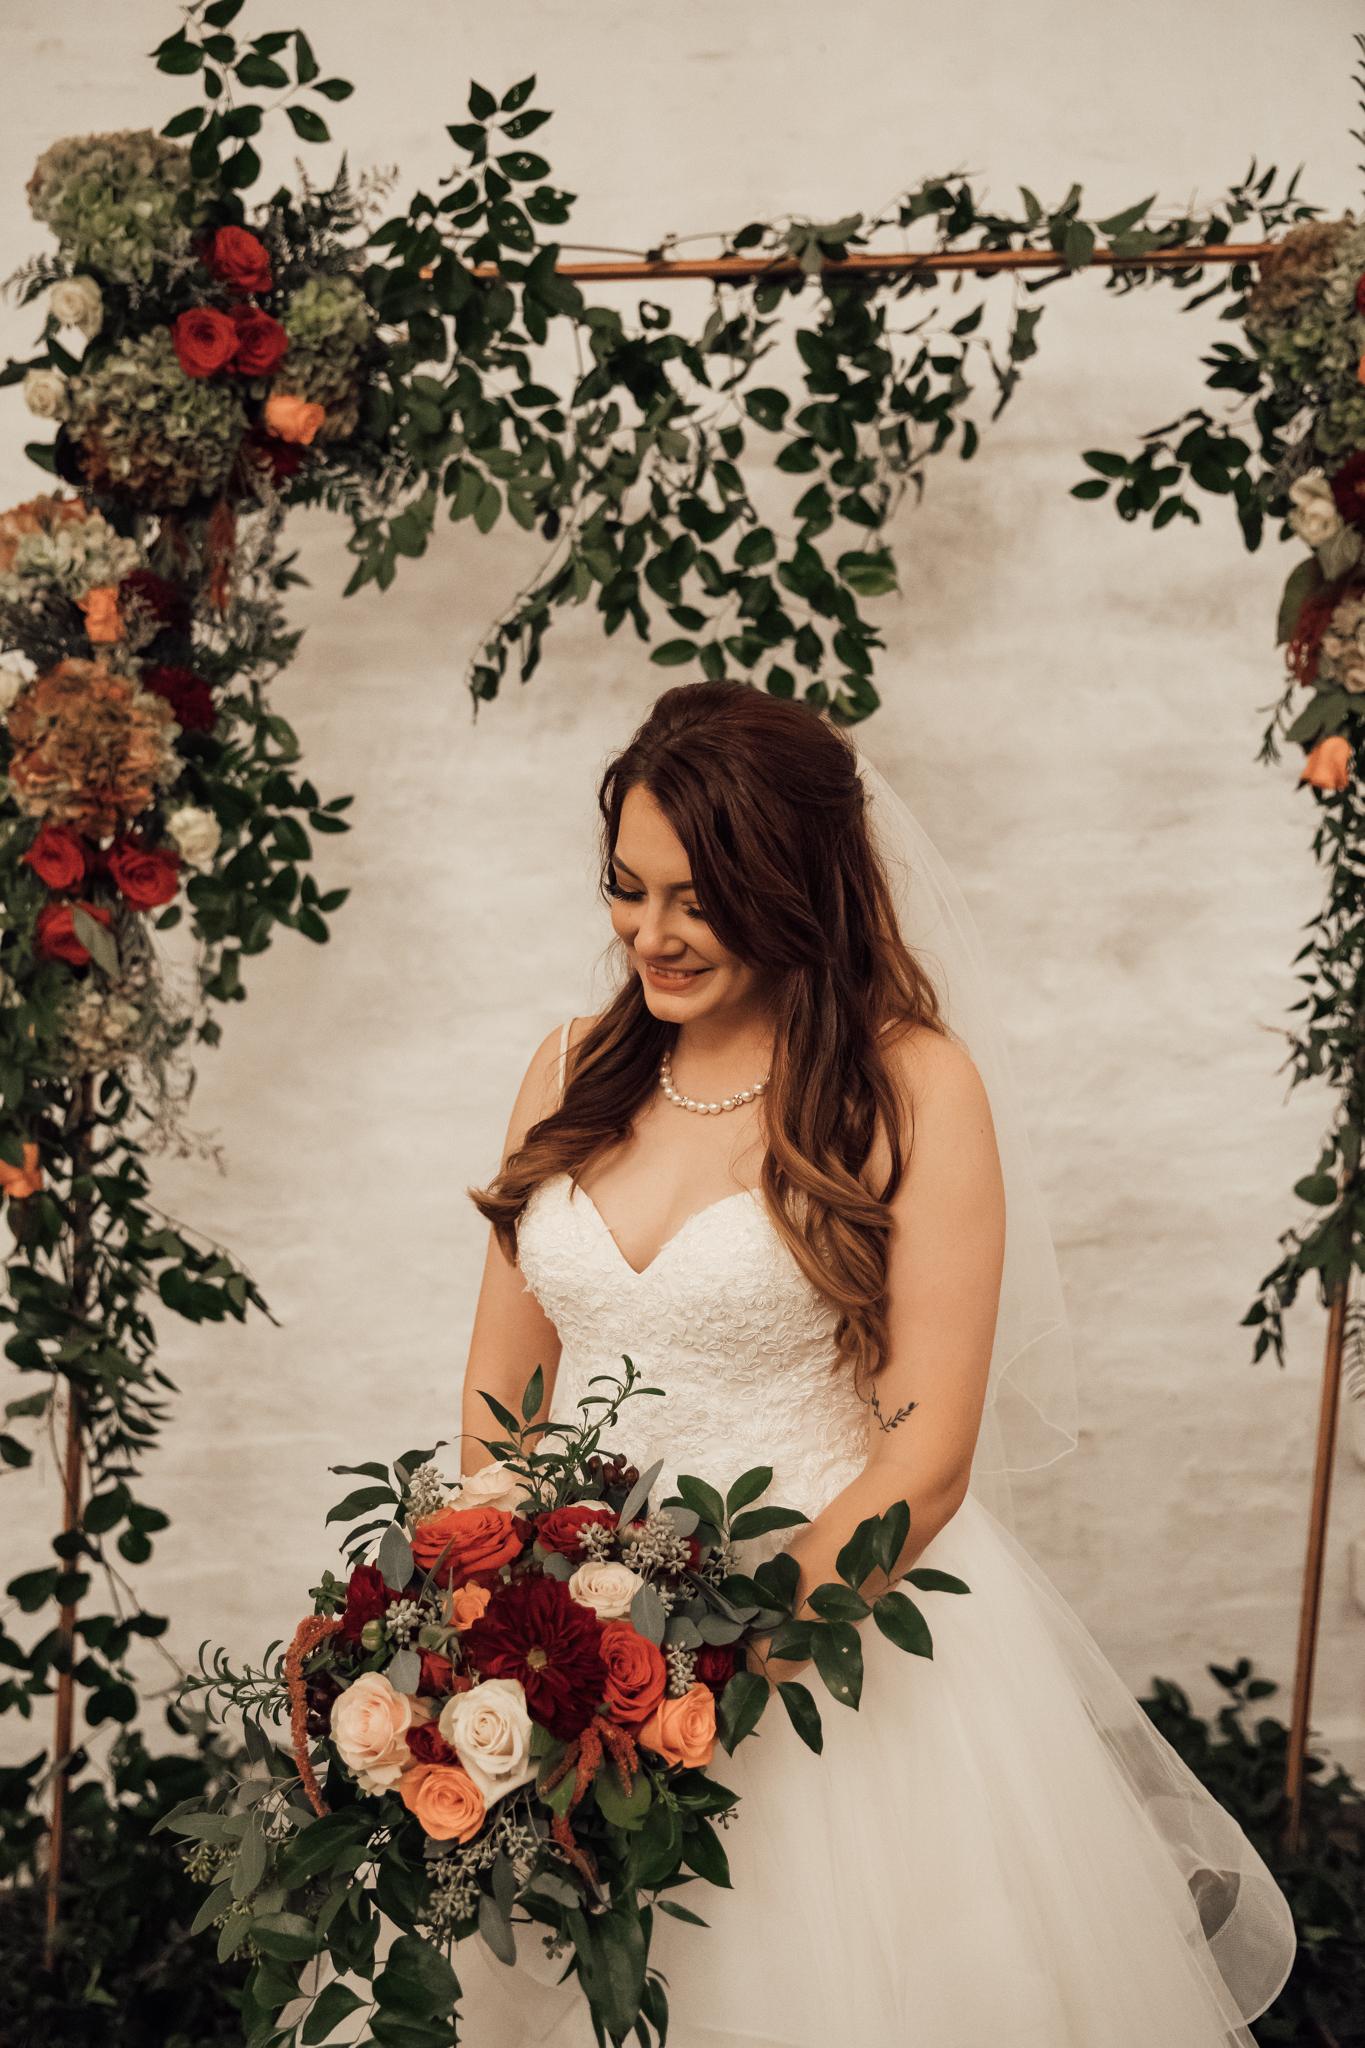 memphis-wedding-photographers-thewarmtharoundyou-ballinese-ballroom (179 of 232).jpg